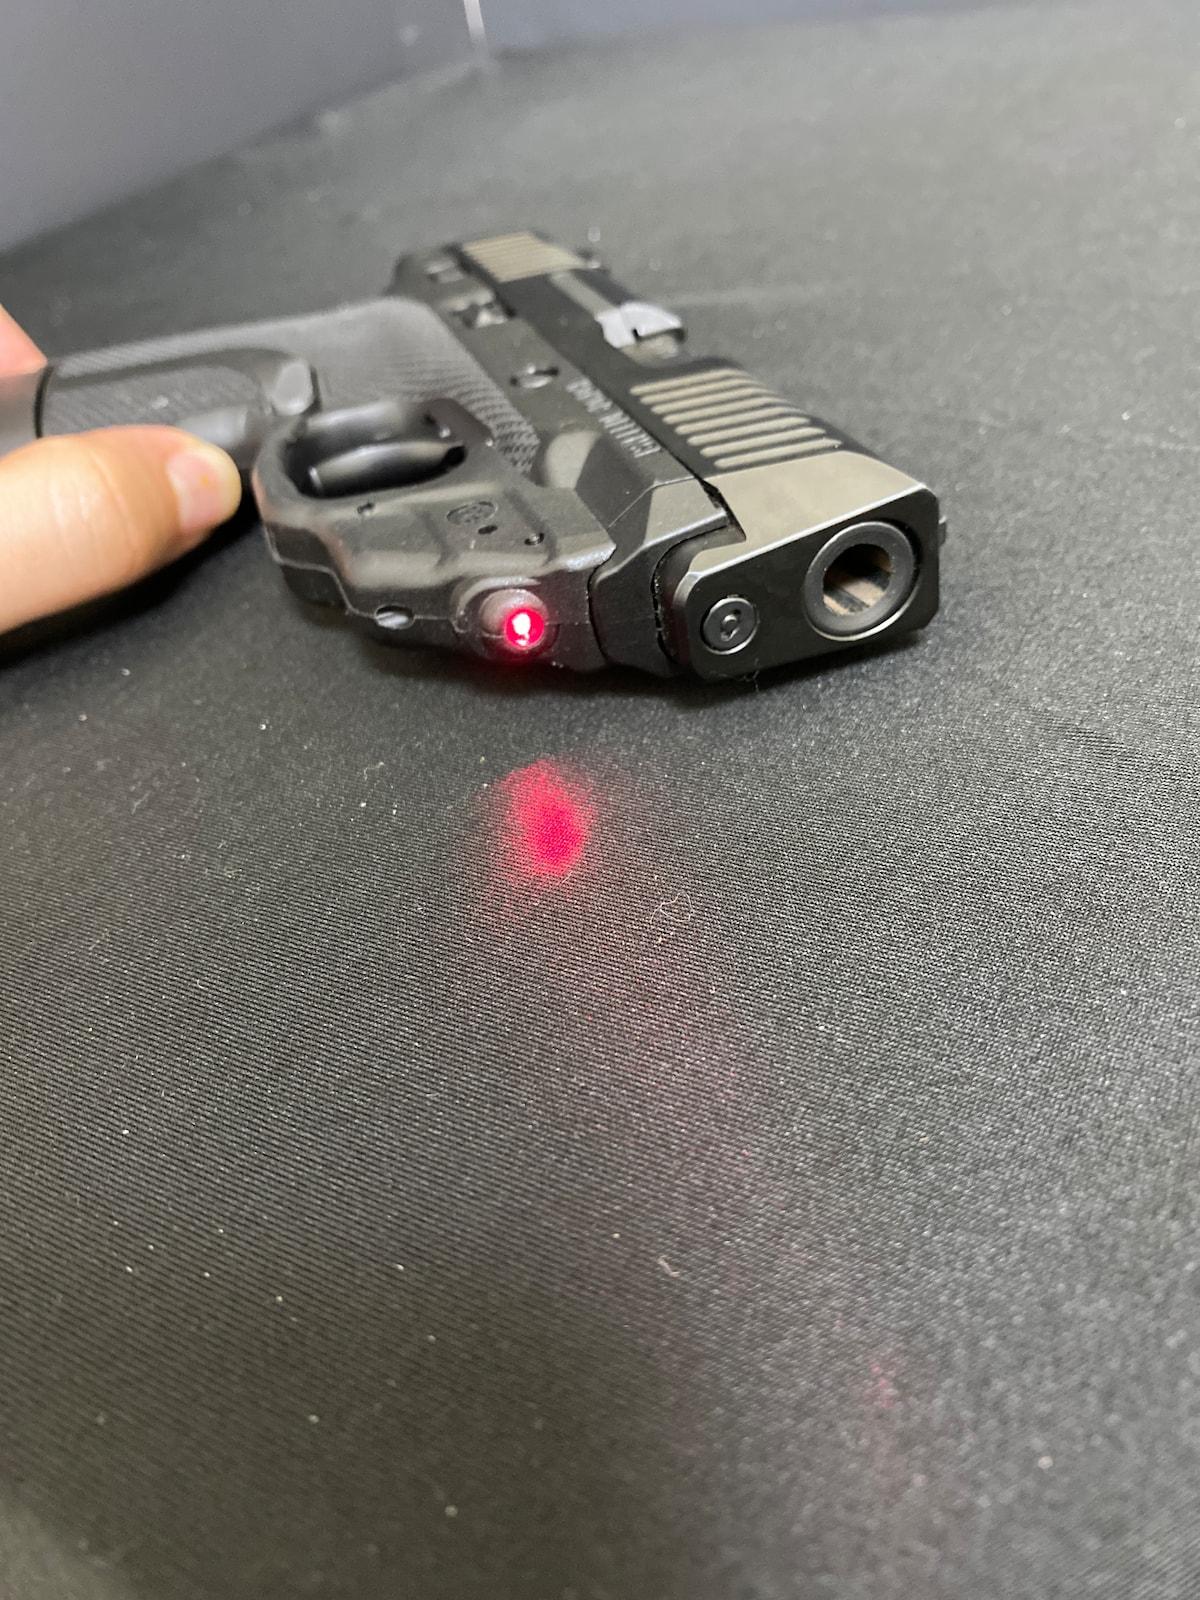 HONOR DEFENSE HONOR GUARD SUB-COMPACT